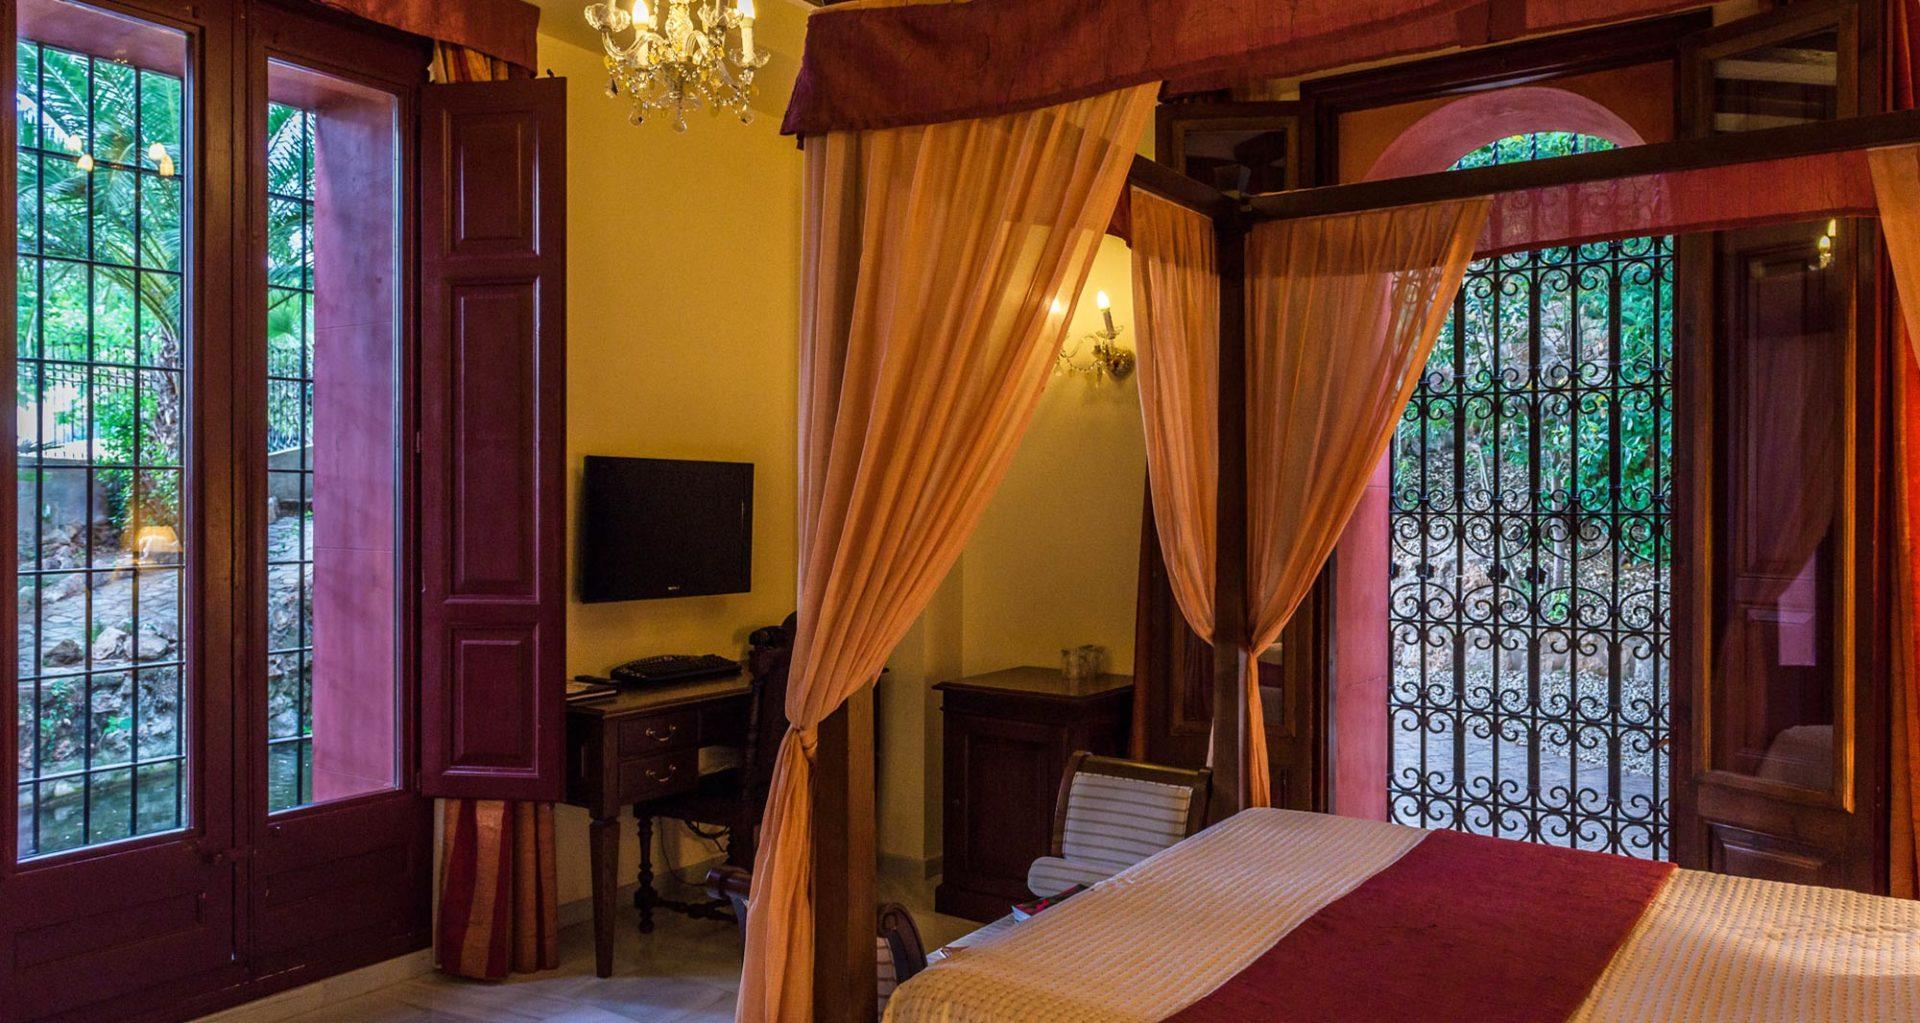 Hotel-Villa-Retiro-Xerta-Ebre-escapada-romantica-de-lujo